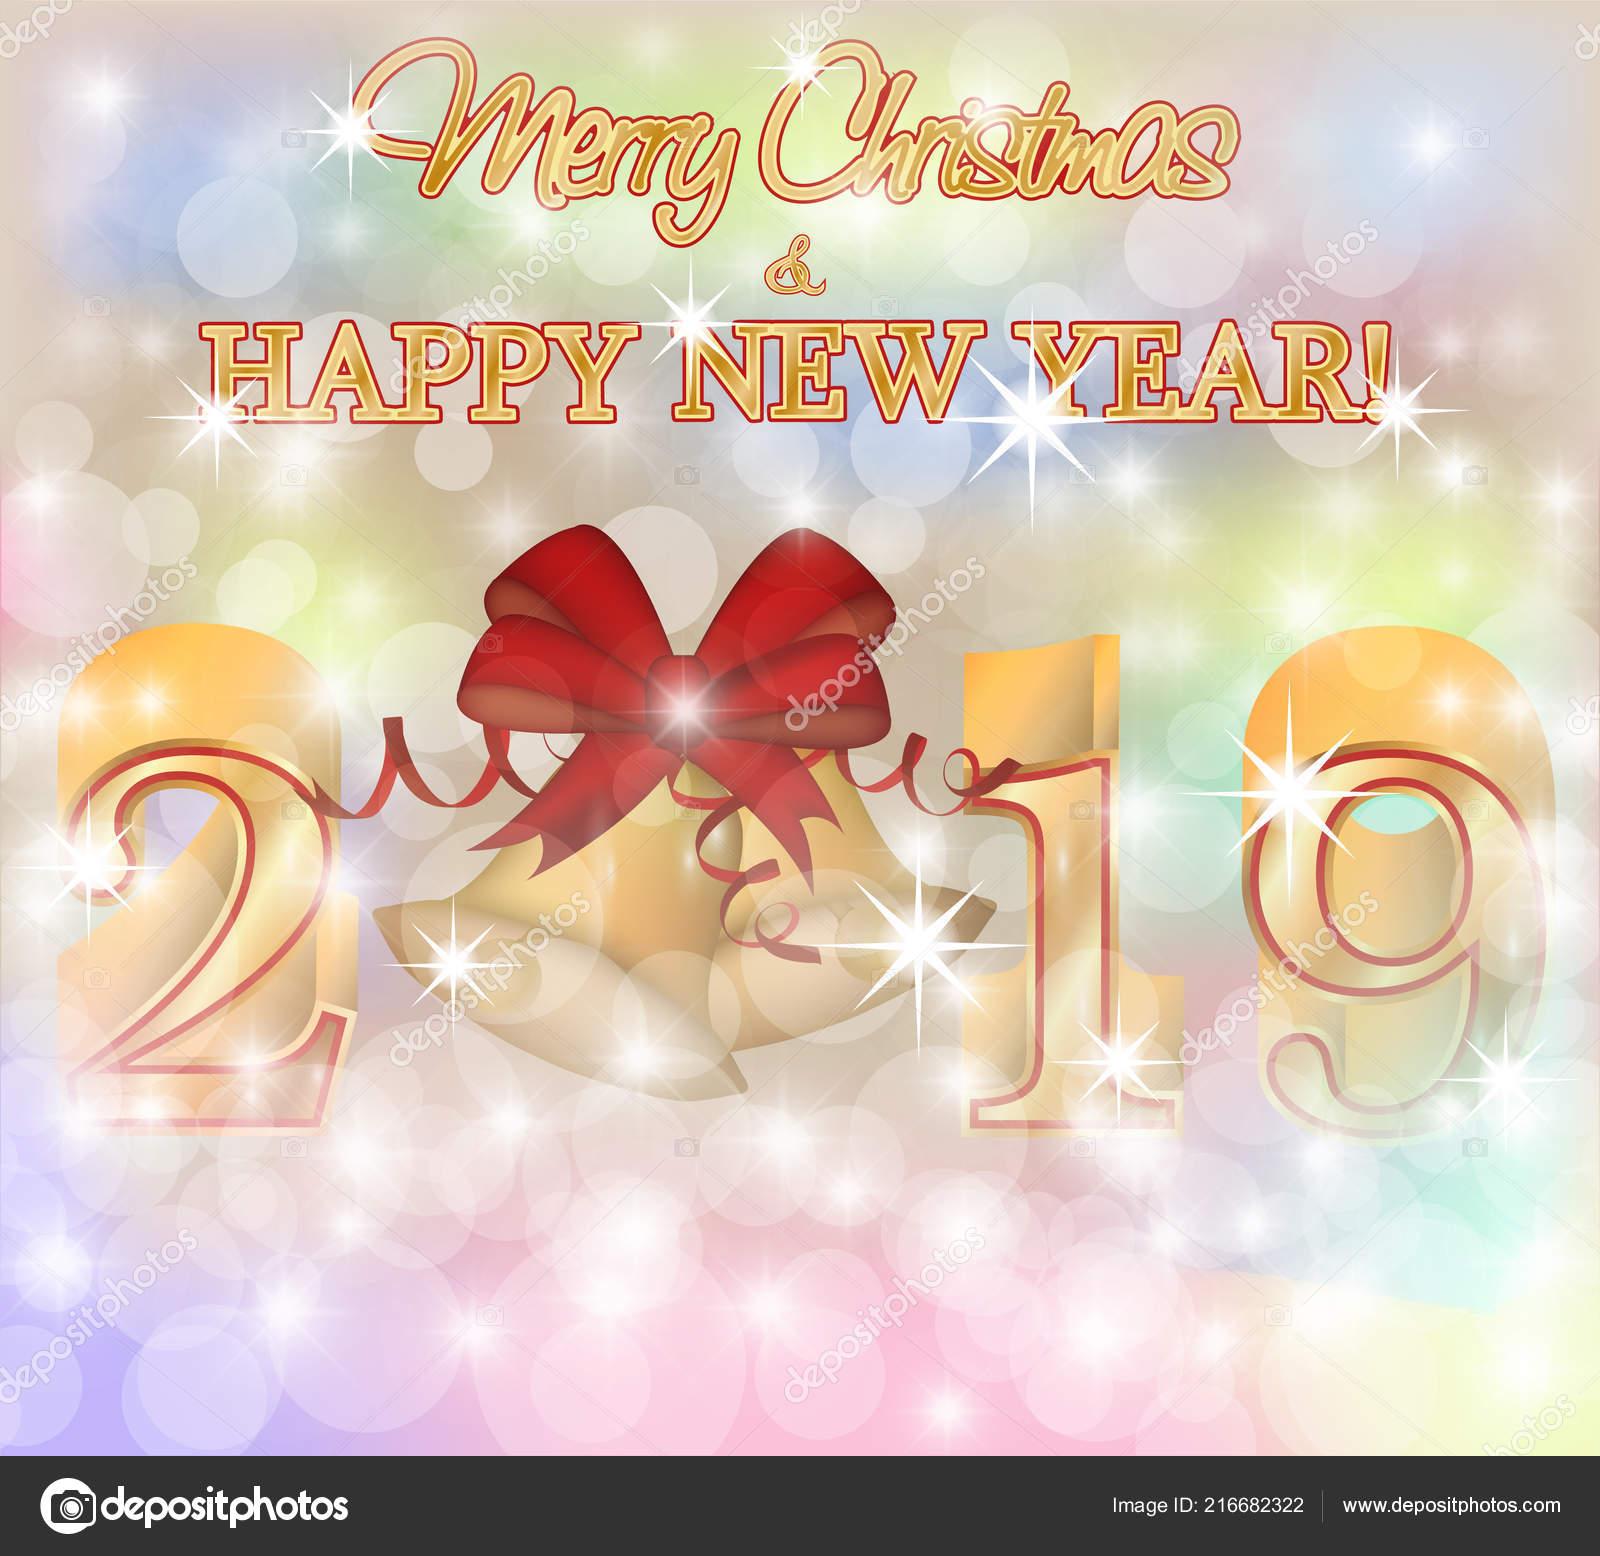 merry christmas happy 2019 new year invitation card vector illustration stock vector